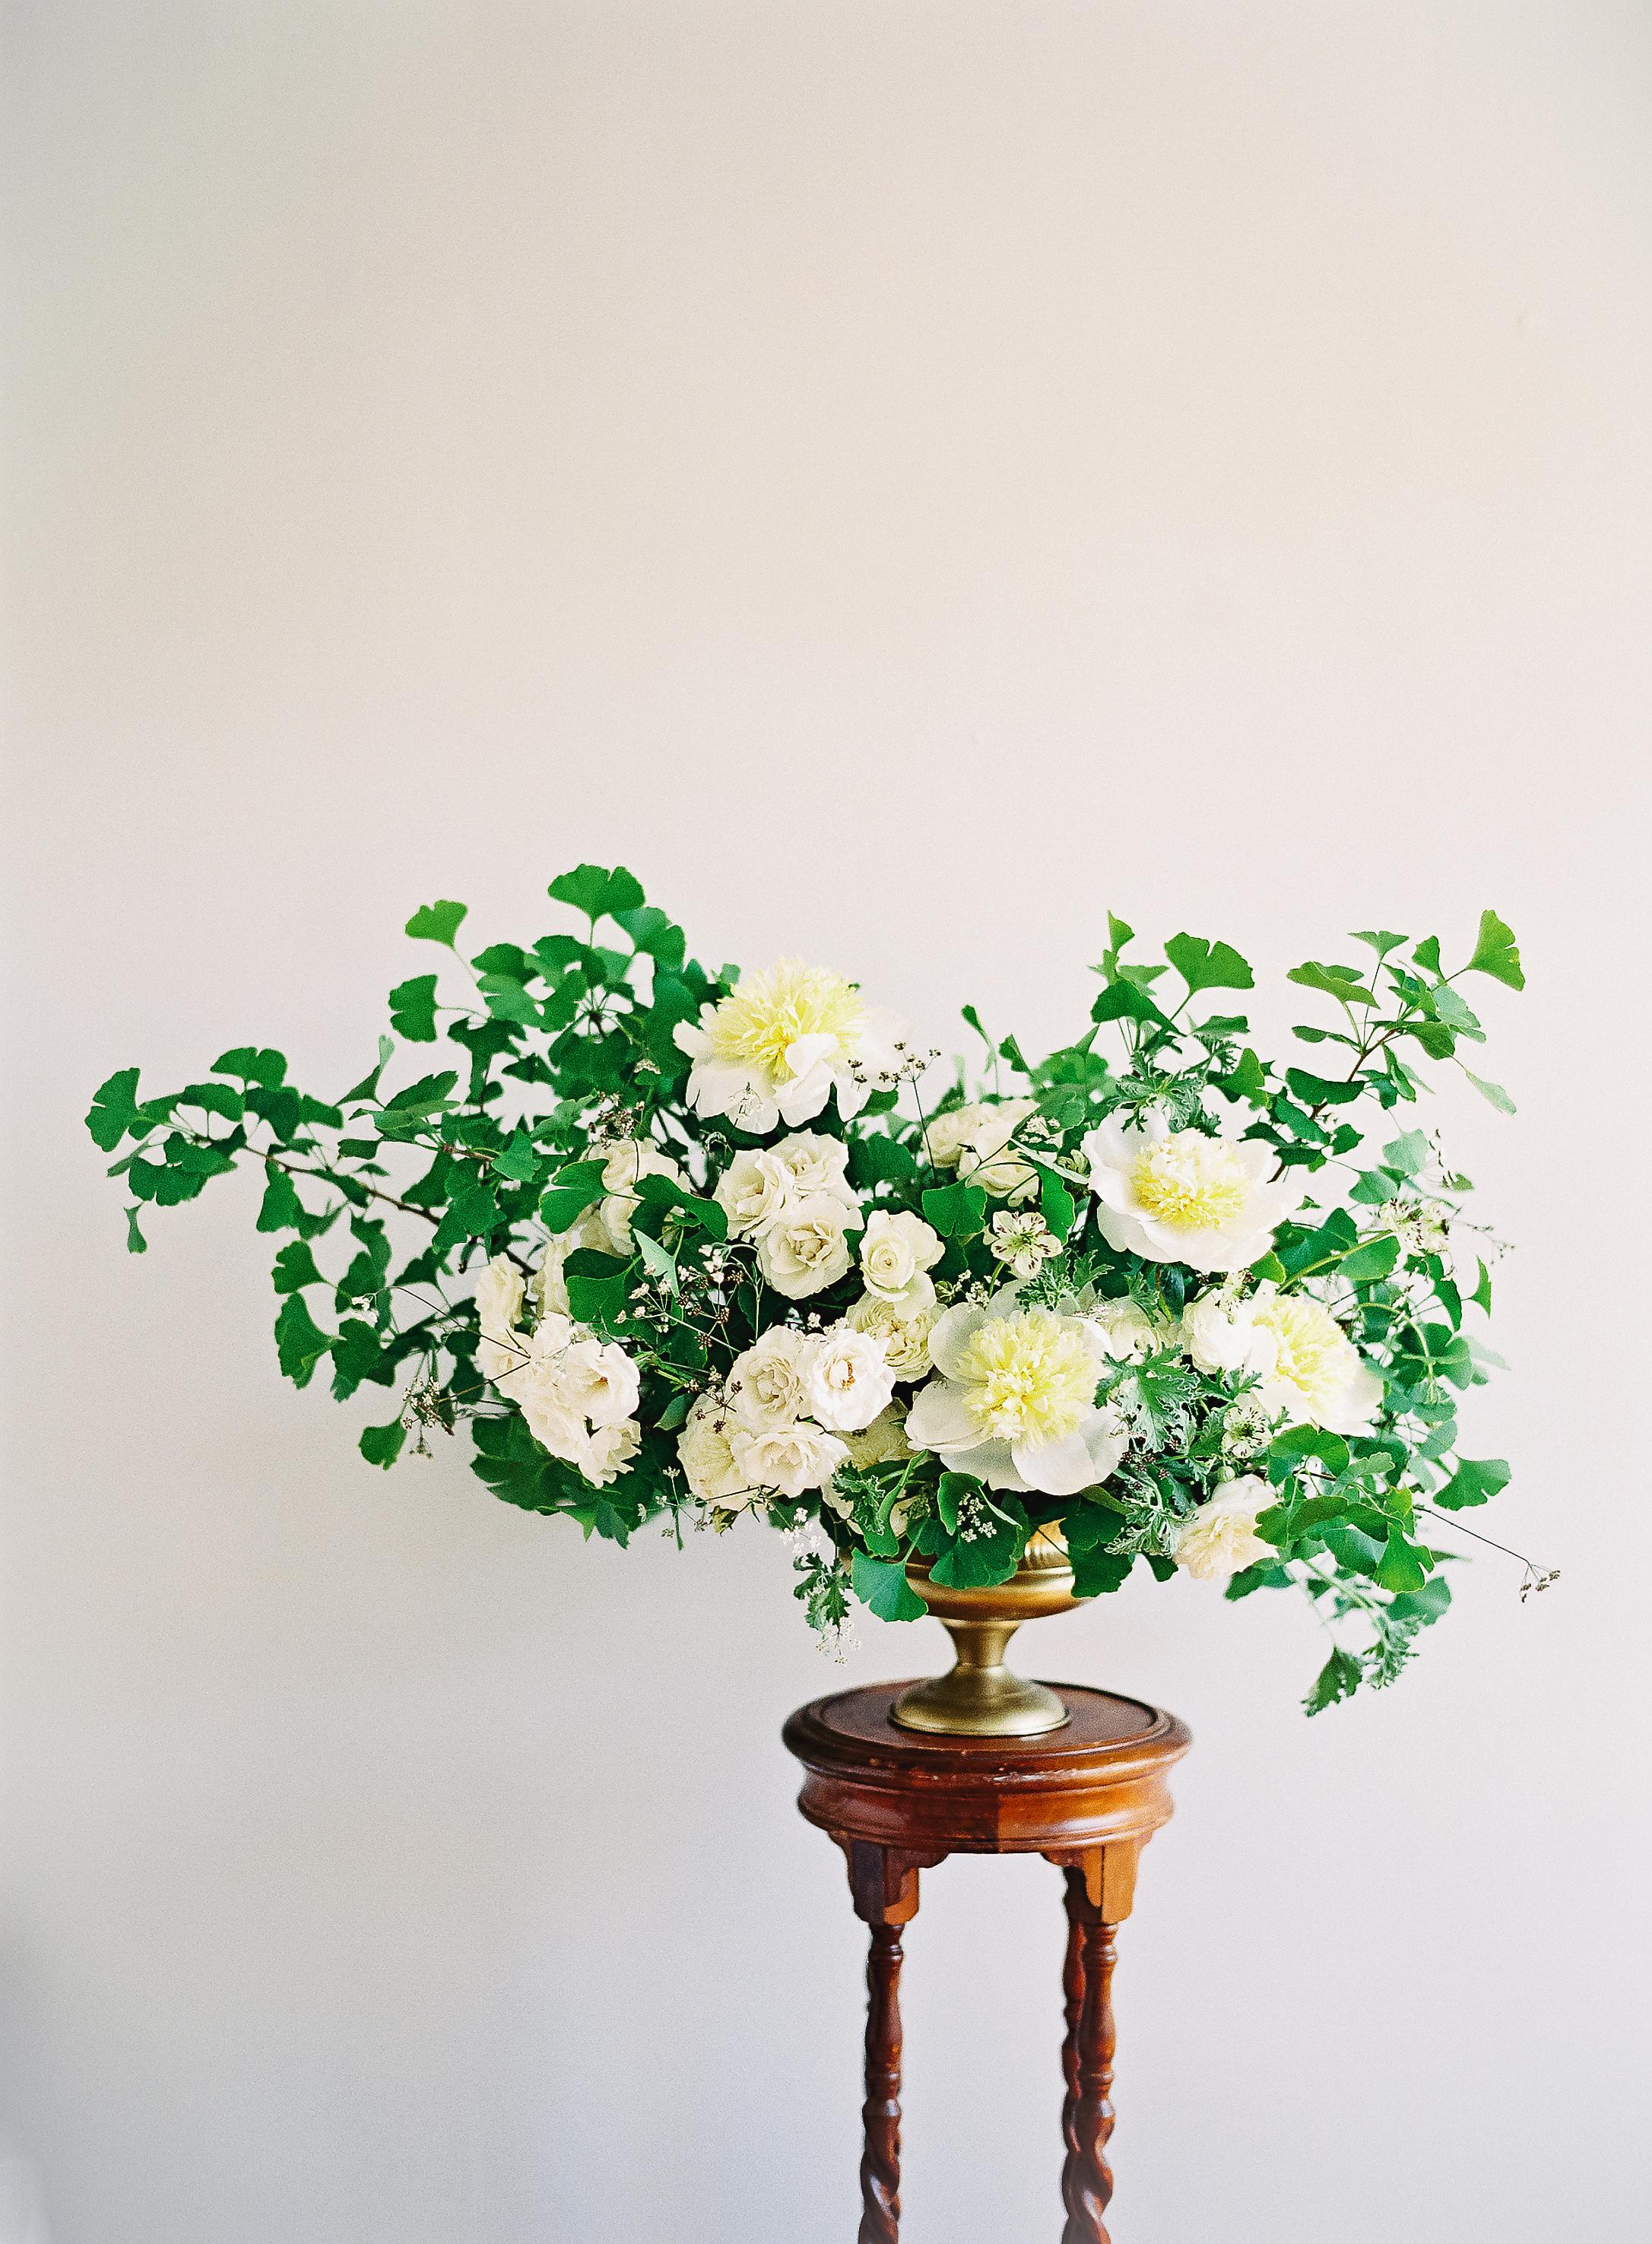 Michele_Beckwith_HP_Flowers_002.JPG